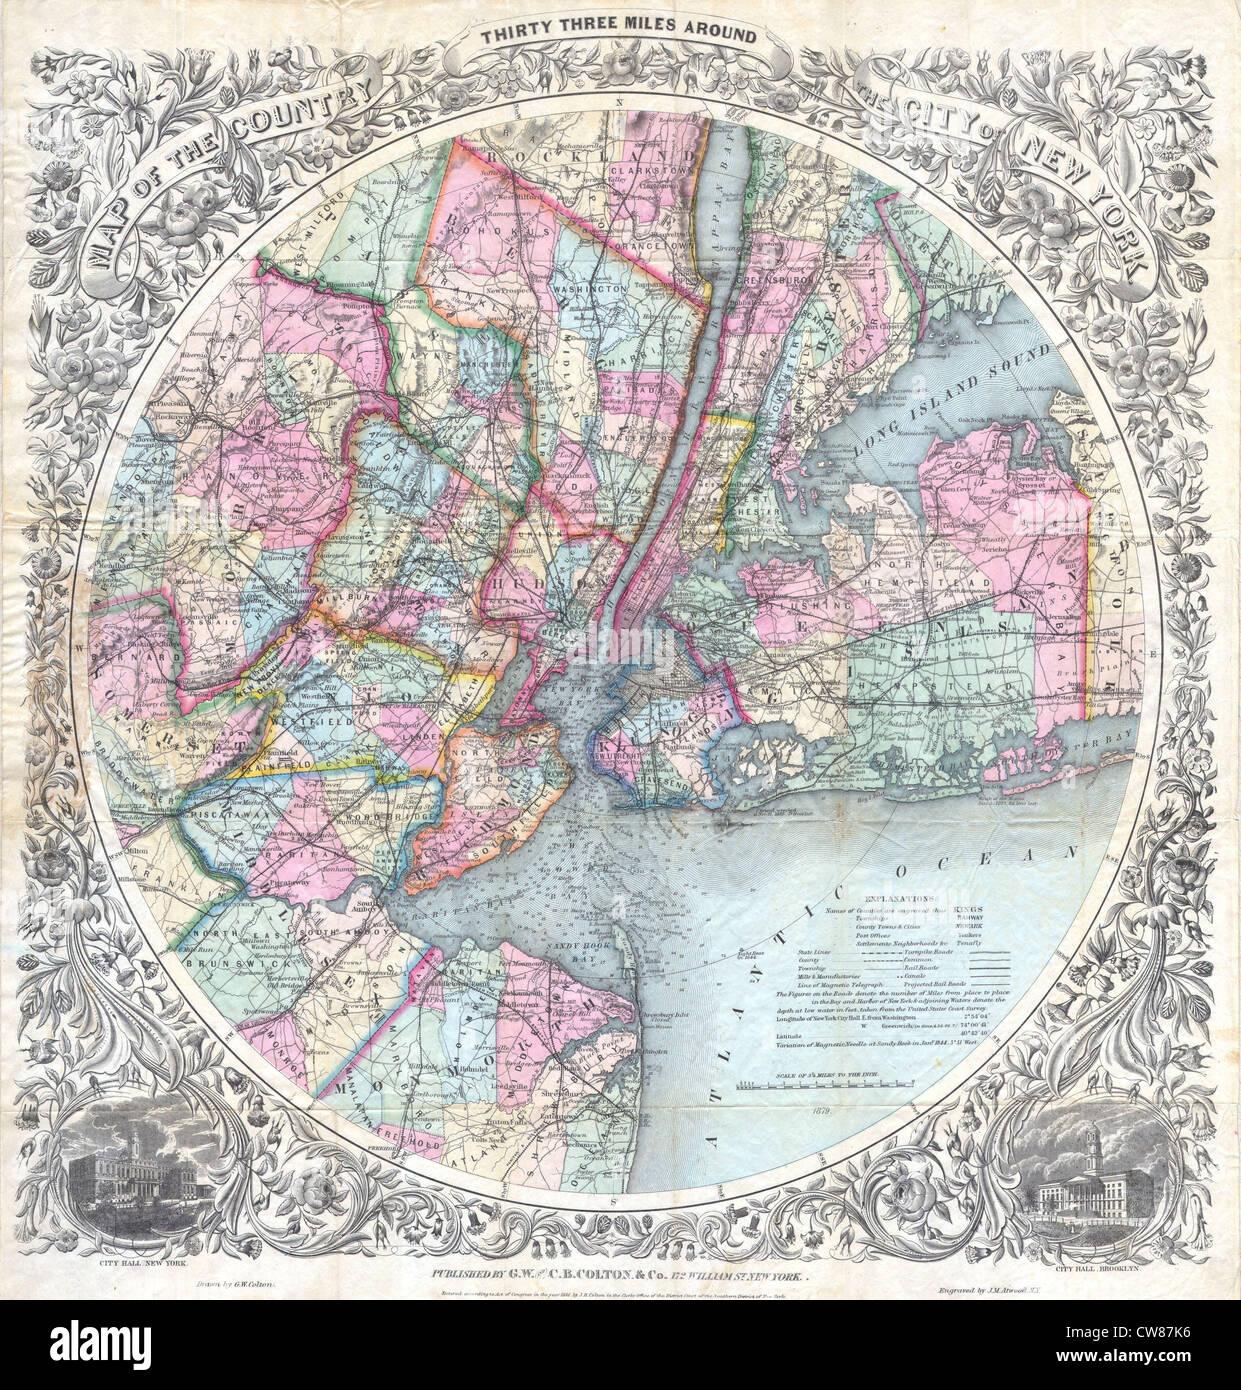 1846 - 1879 Colton Map of New York City ^ Vicinity (33 Miles Around) - Stock Image